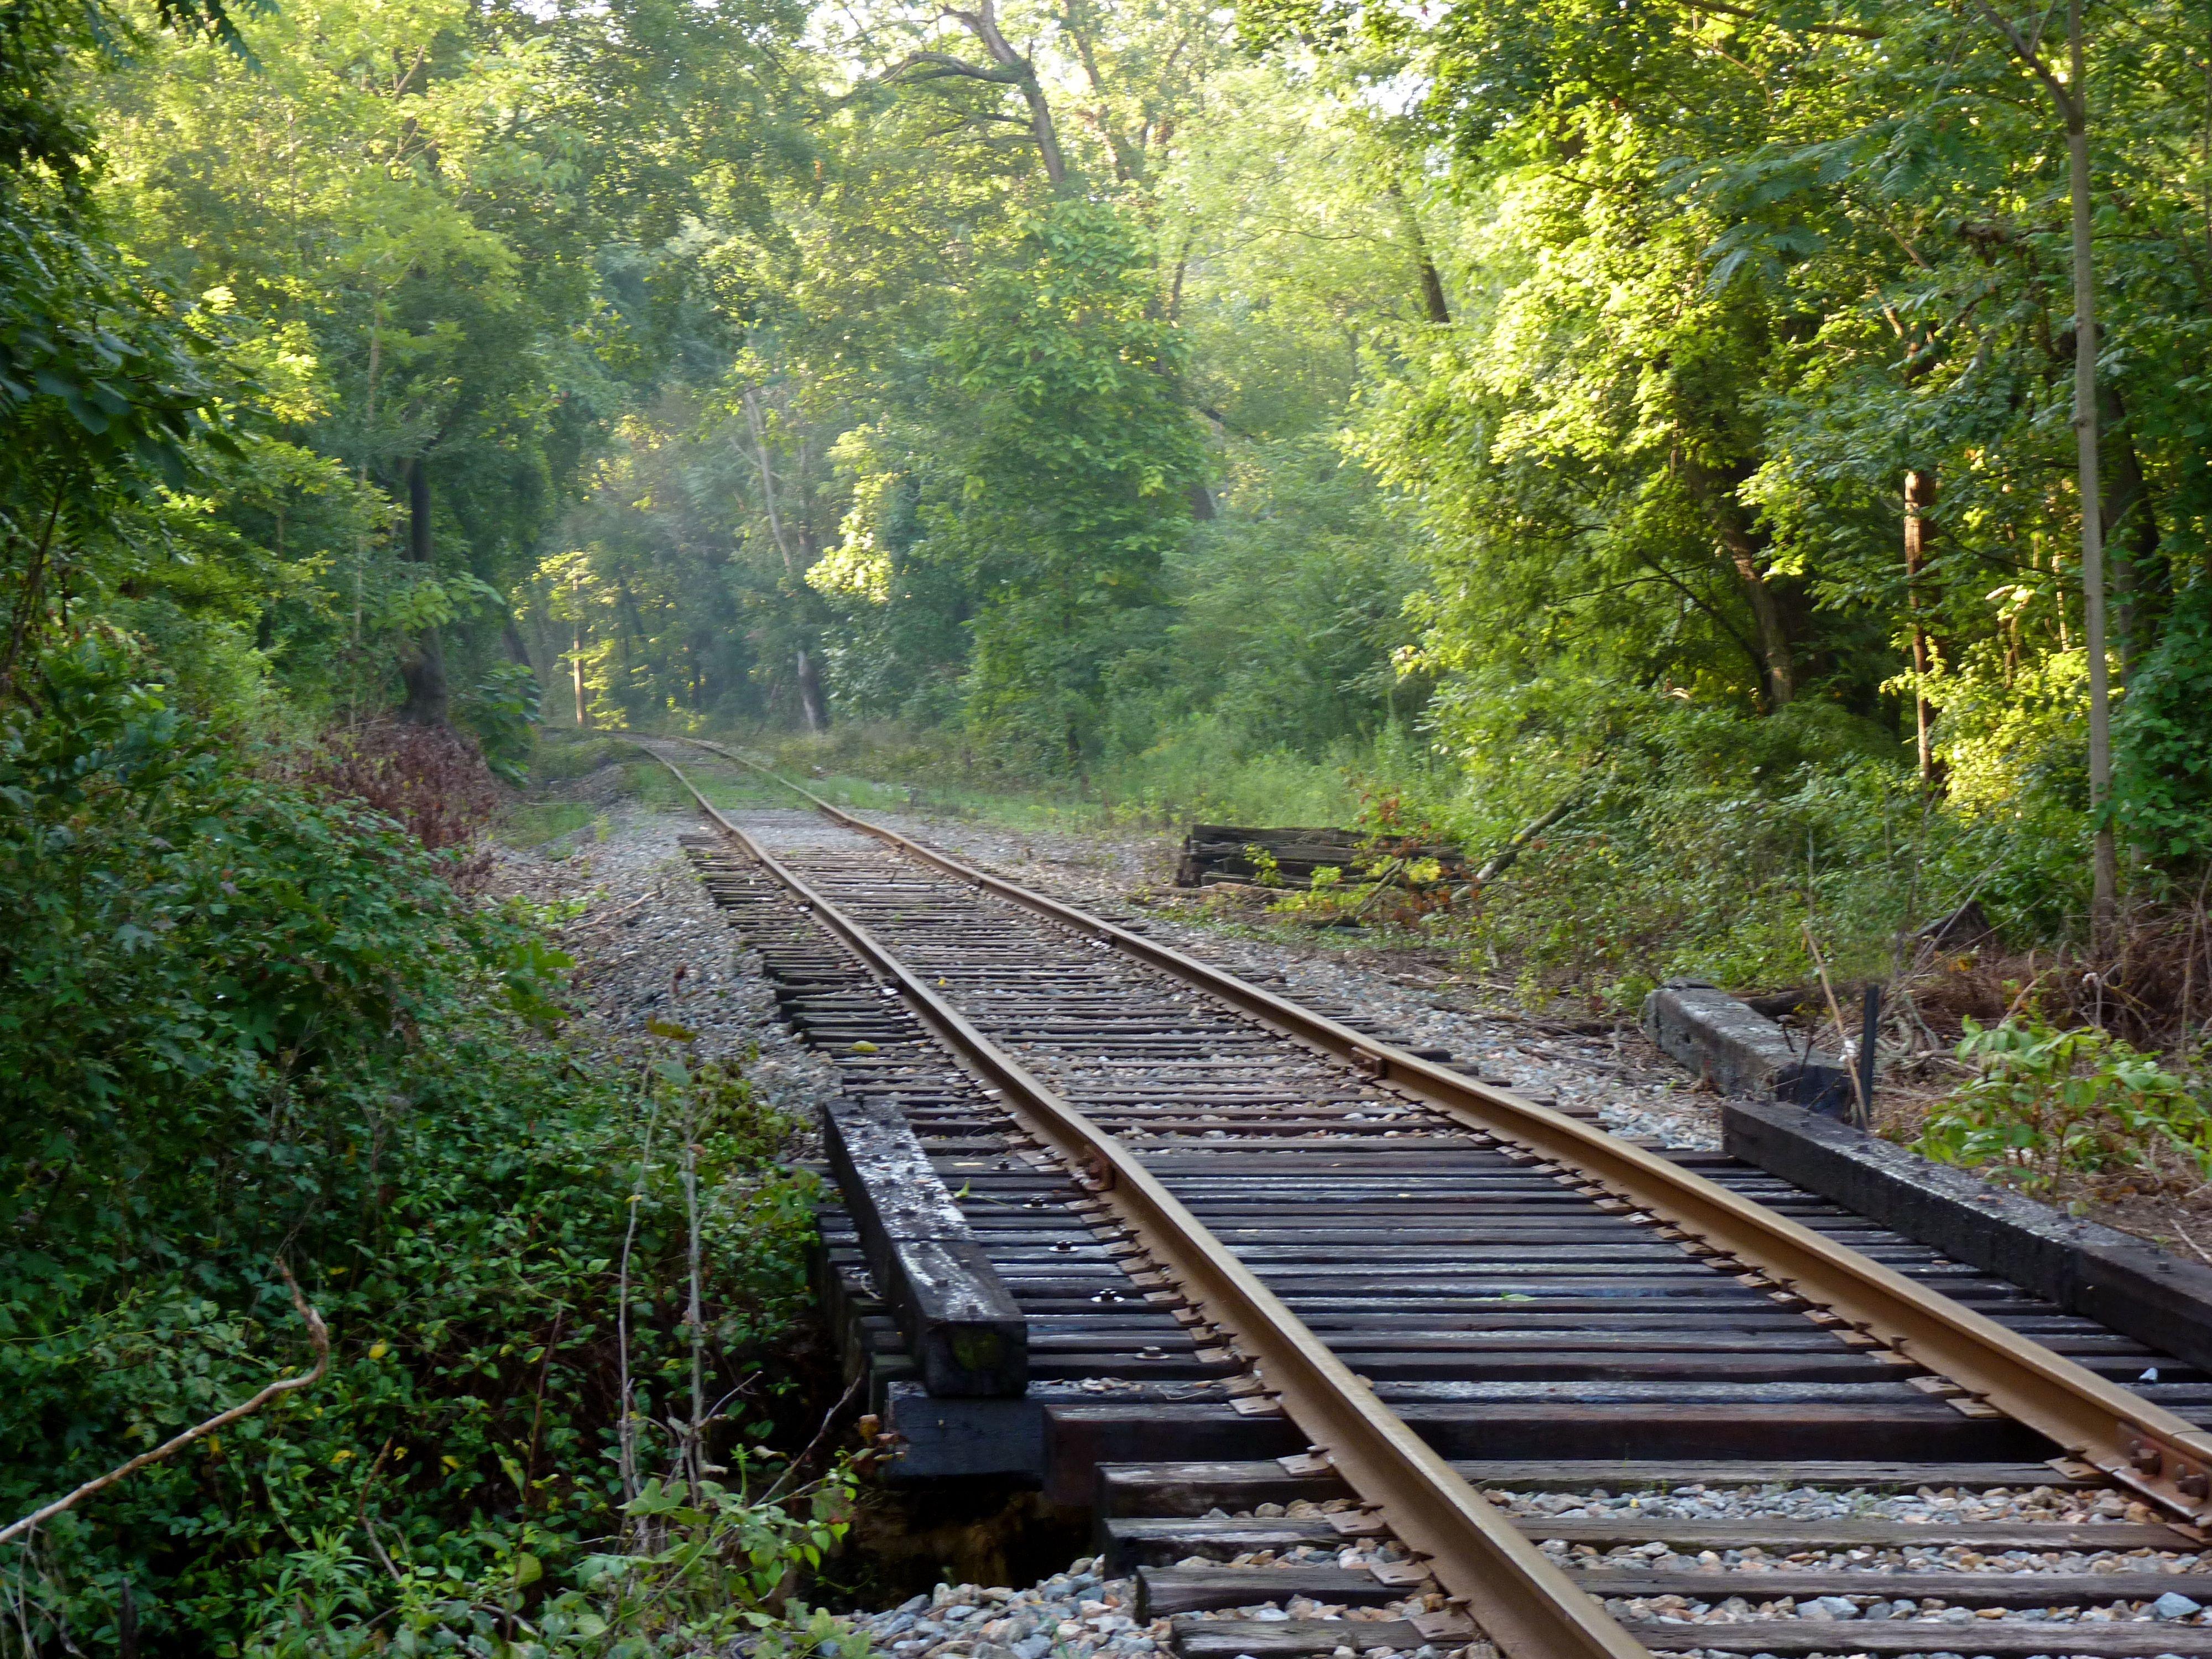 Greenbank stretch of the Wilmington & Western Railroad, Wilmington DE